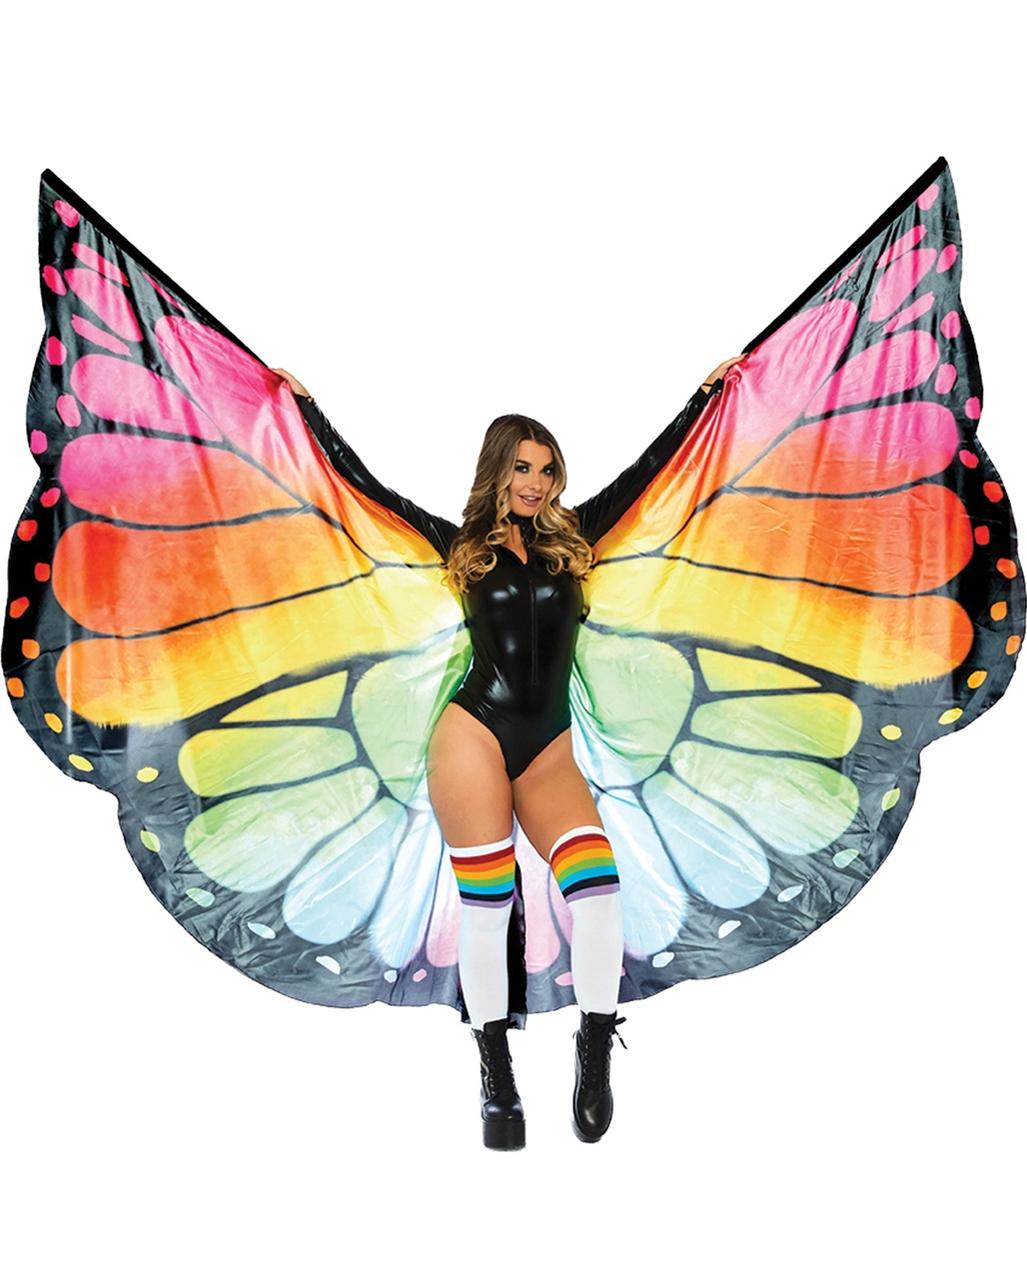 Schmetterlinge anhaken